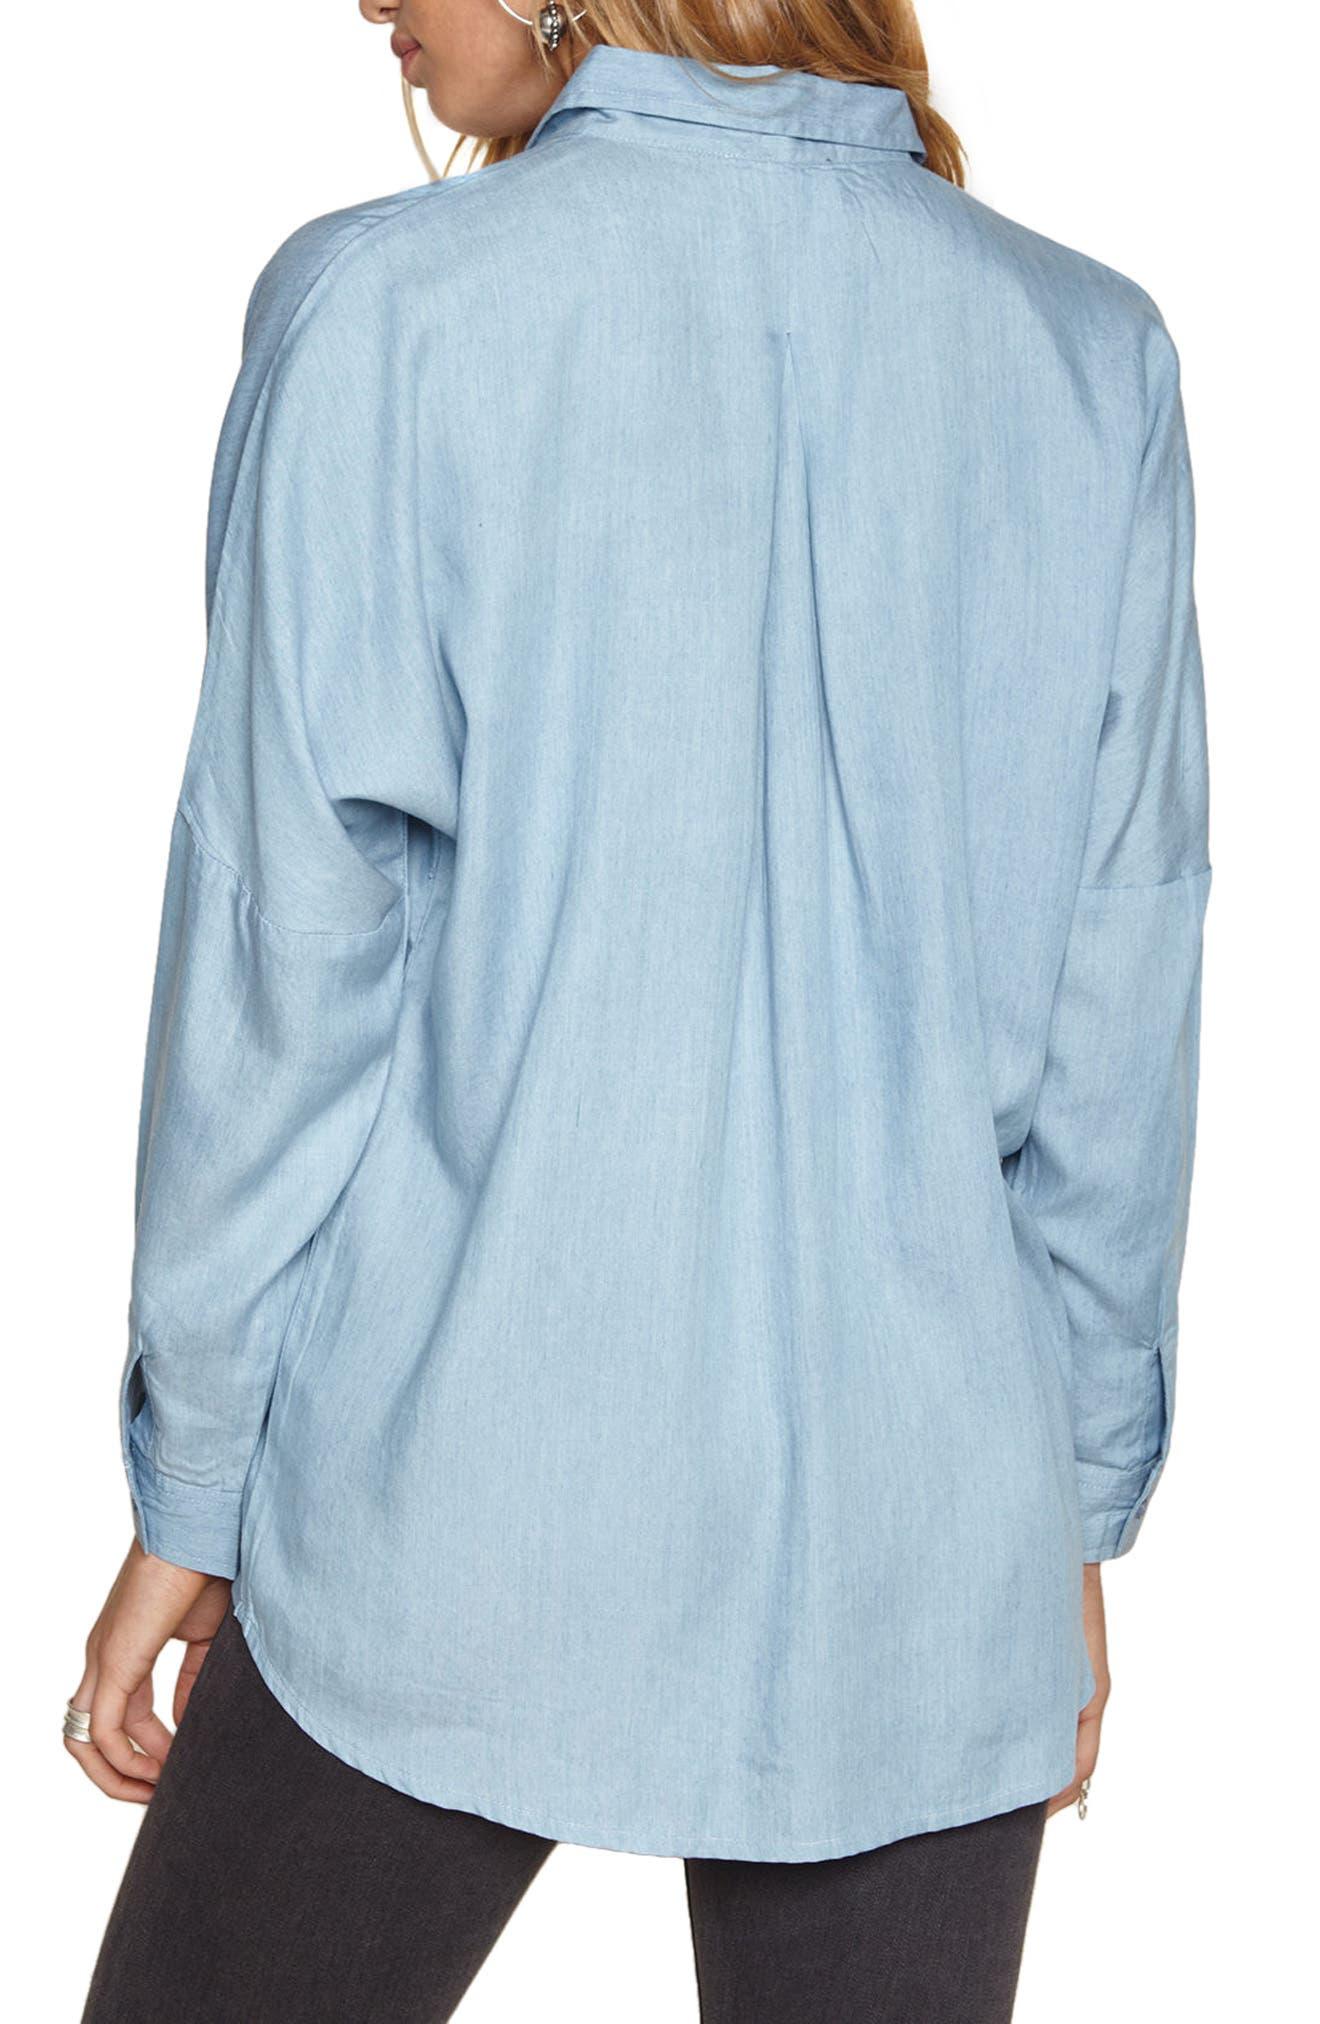 Alternate Image 3  - Amuse Society Casual Fridays Chambray Shirt